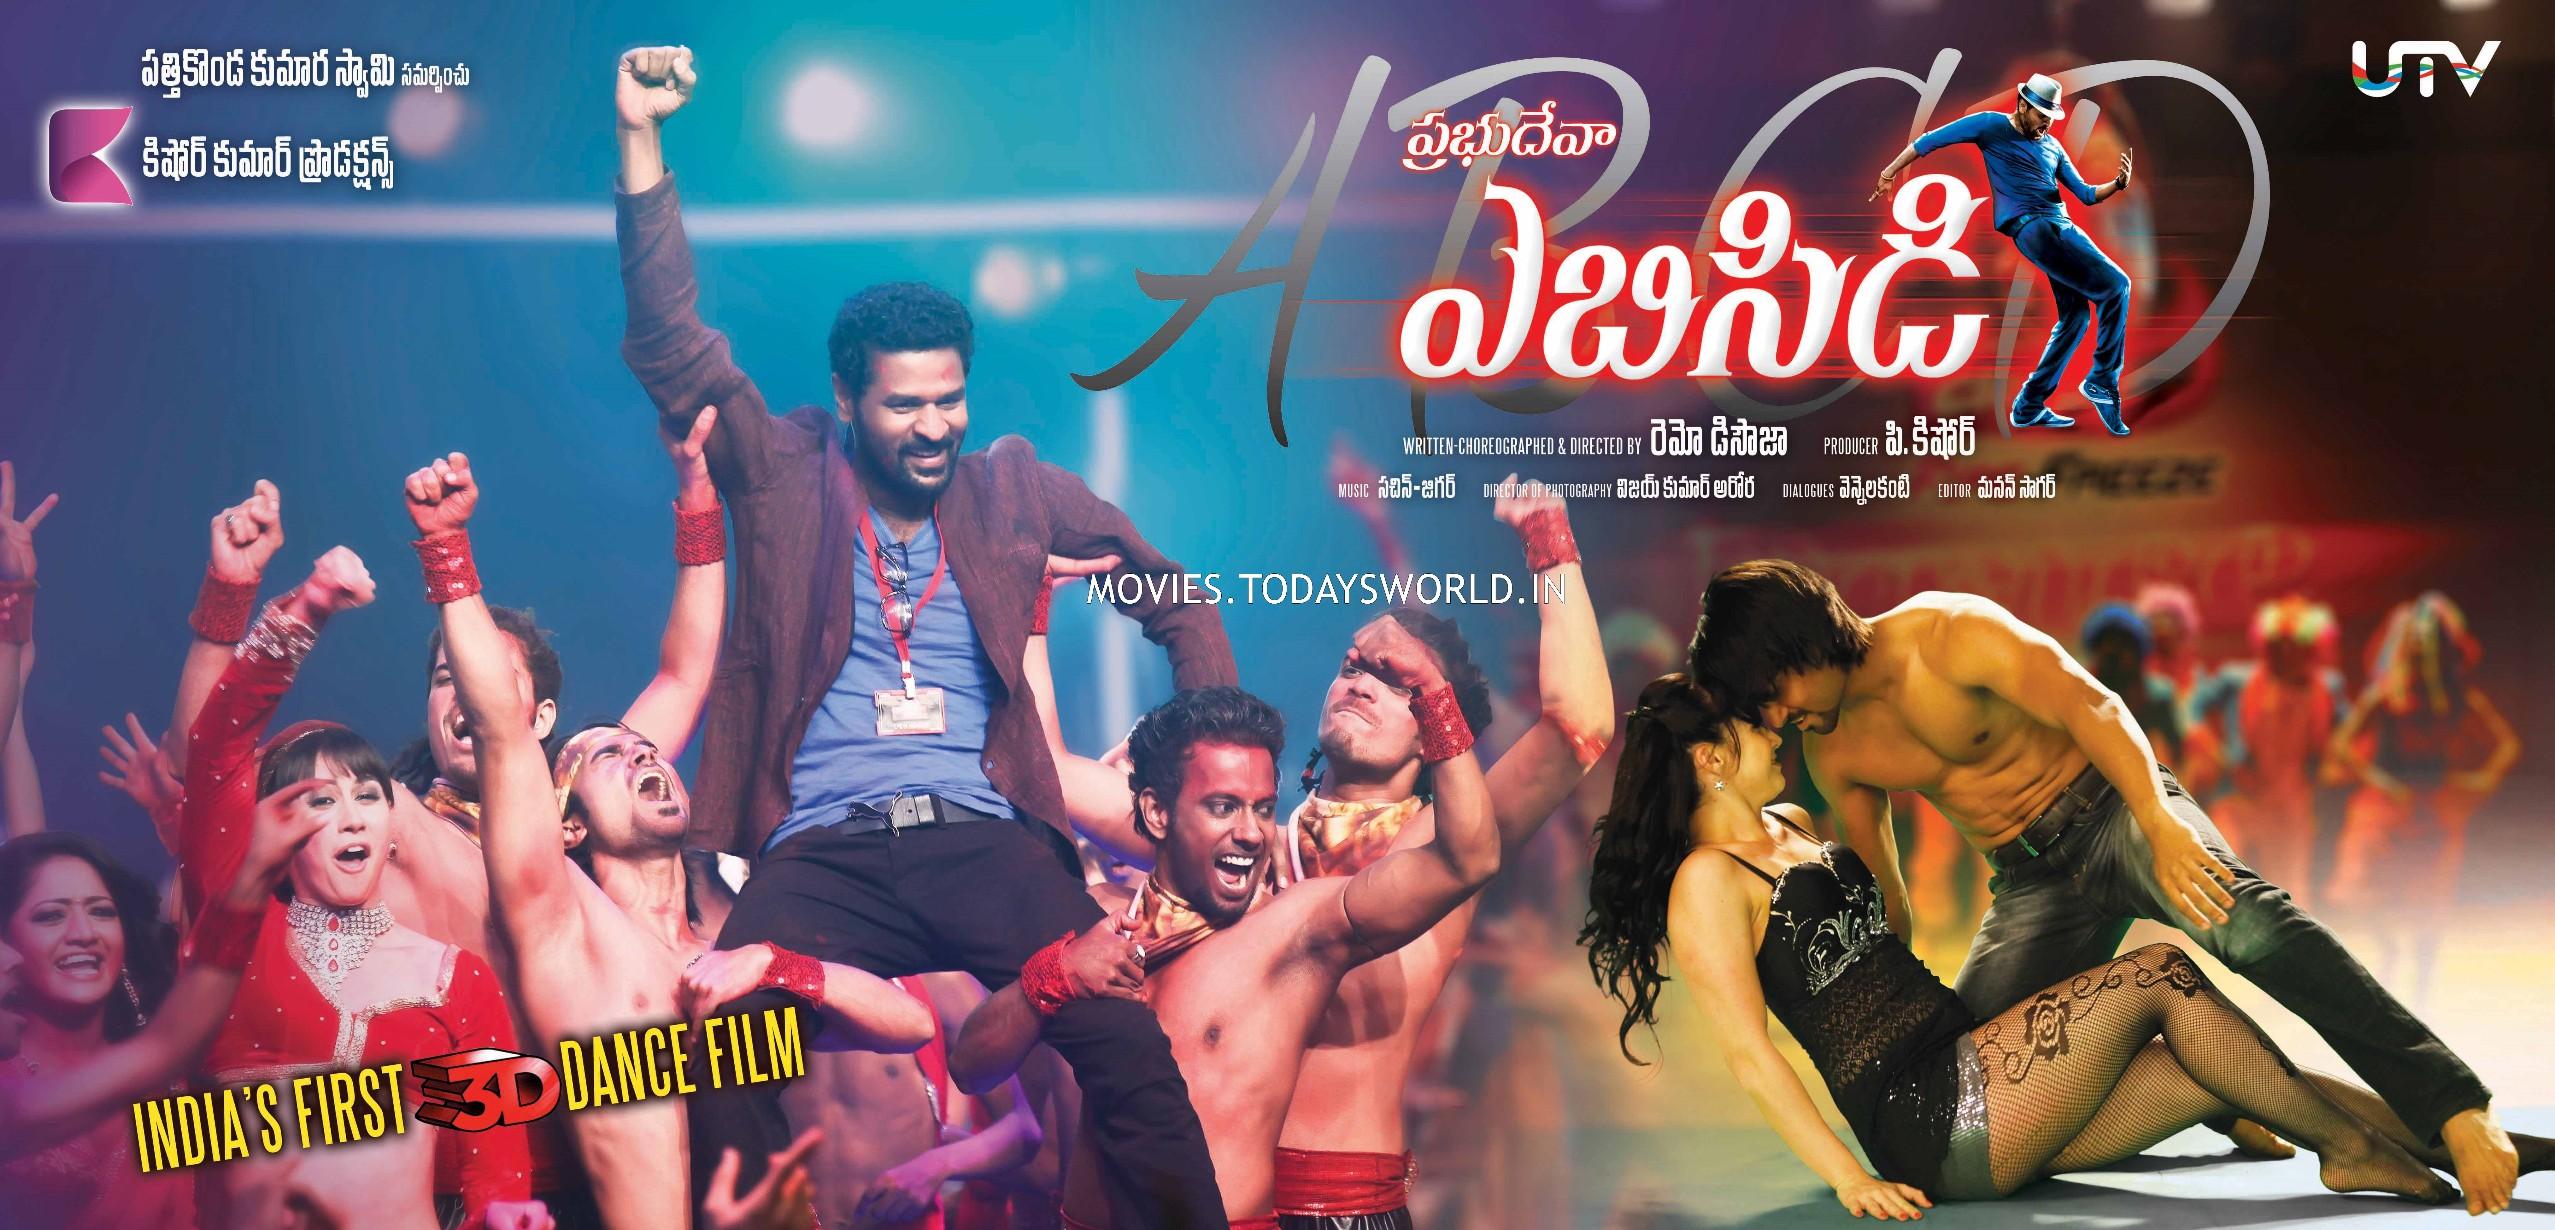 https://2.bp.blogspot.com/-zas_yjKHBCQ/UQEgHFgIfXI/AAAAAAAAXew/5nOS-KvoiAM/s9000/ABCD+Movie+WallPapers,+ABCD+Telugu+Movie+Ultra+HD+Wallpapers,+HD+Posters+-+ www.TodaysWorld.in + (2) .jpg